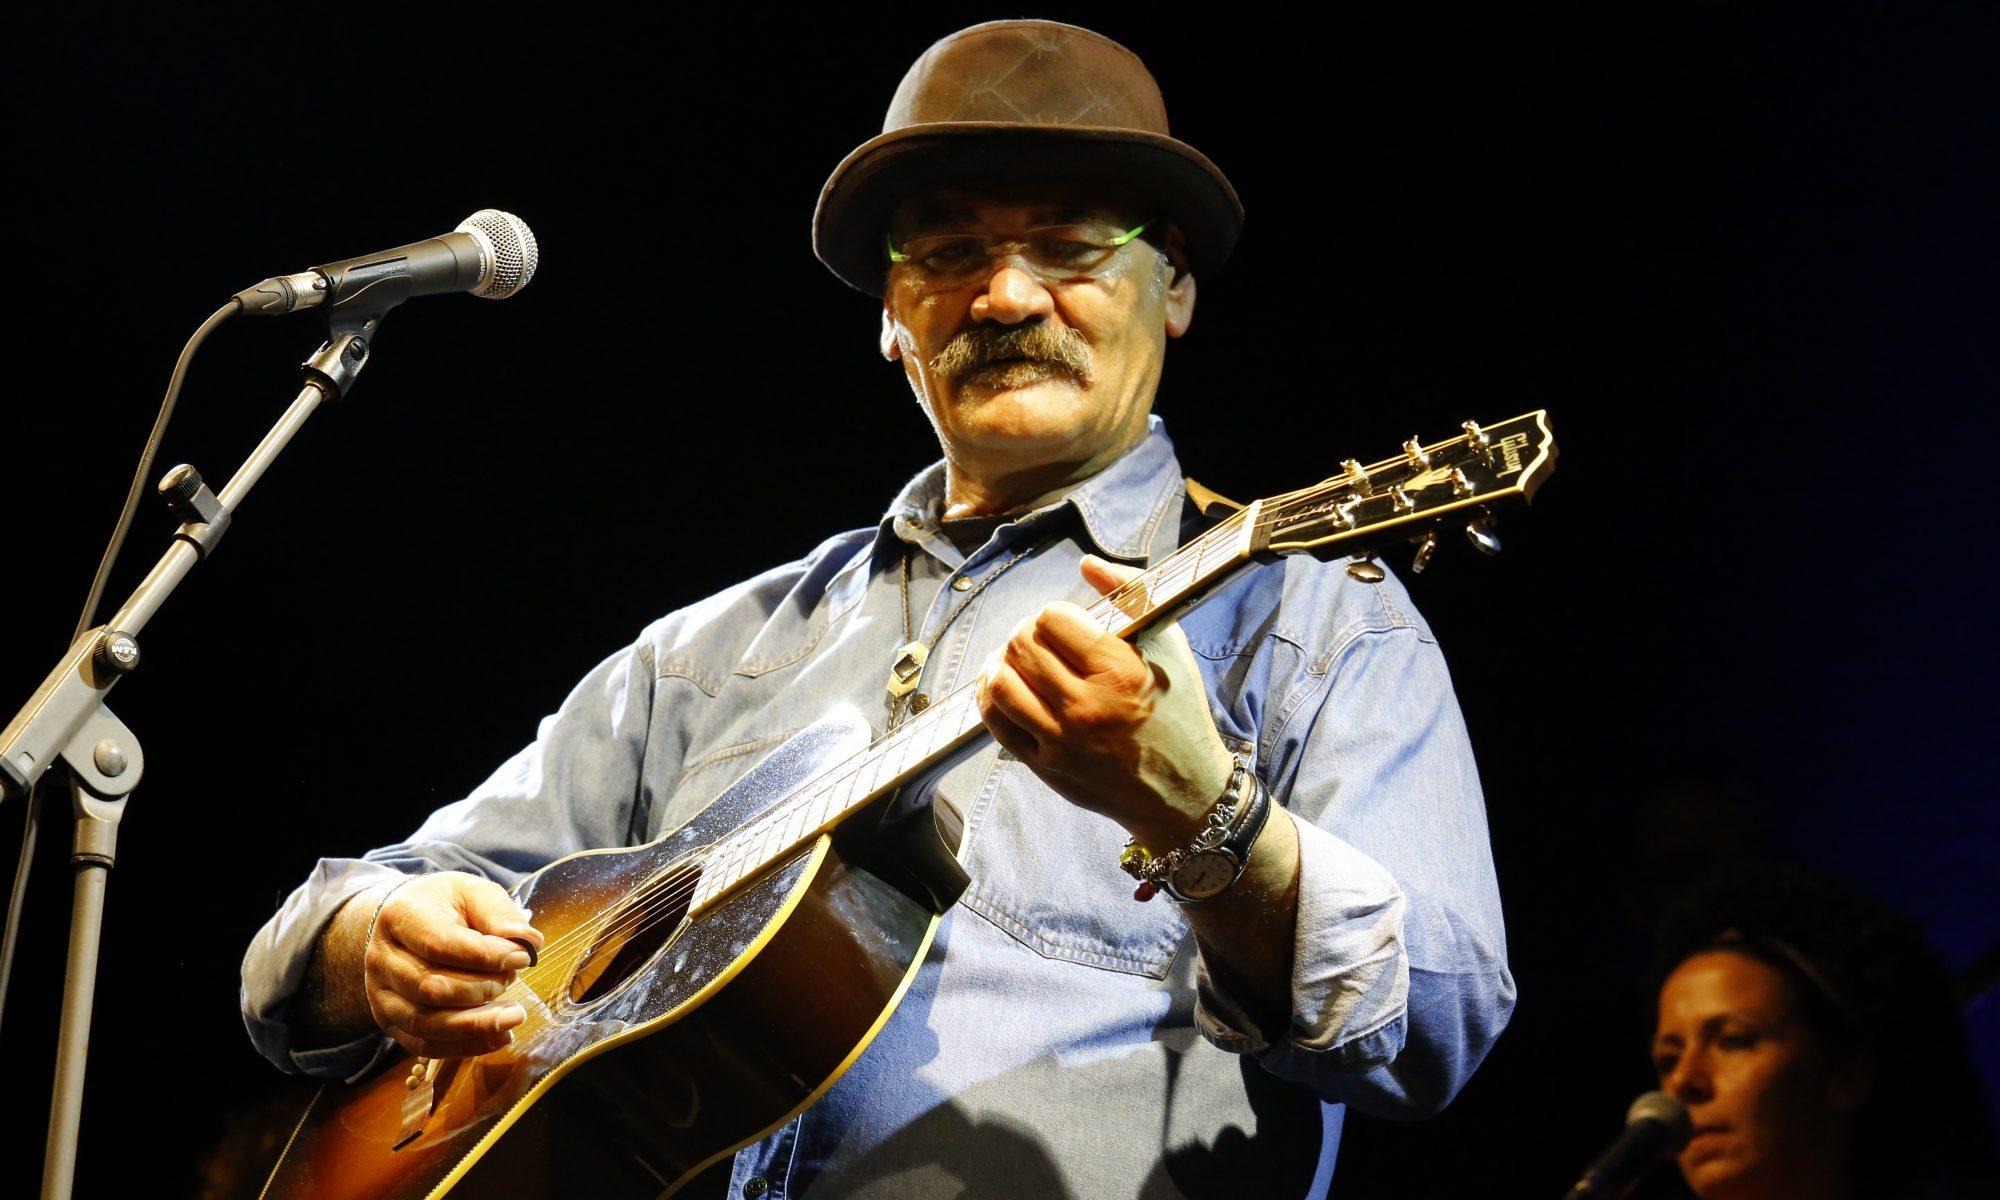 Lino Rufo